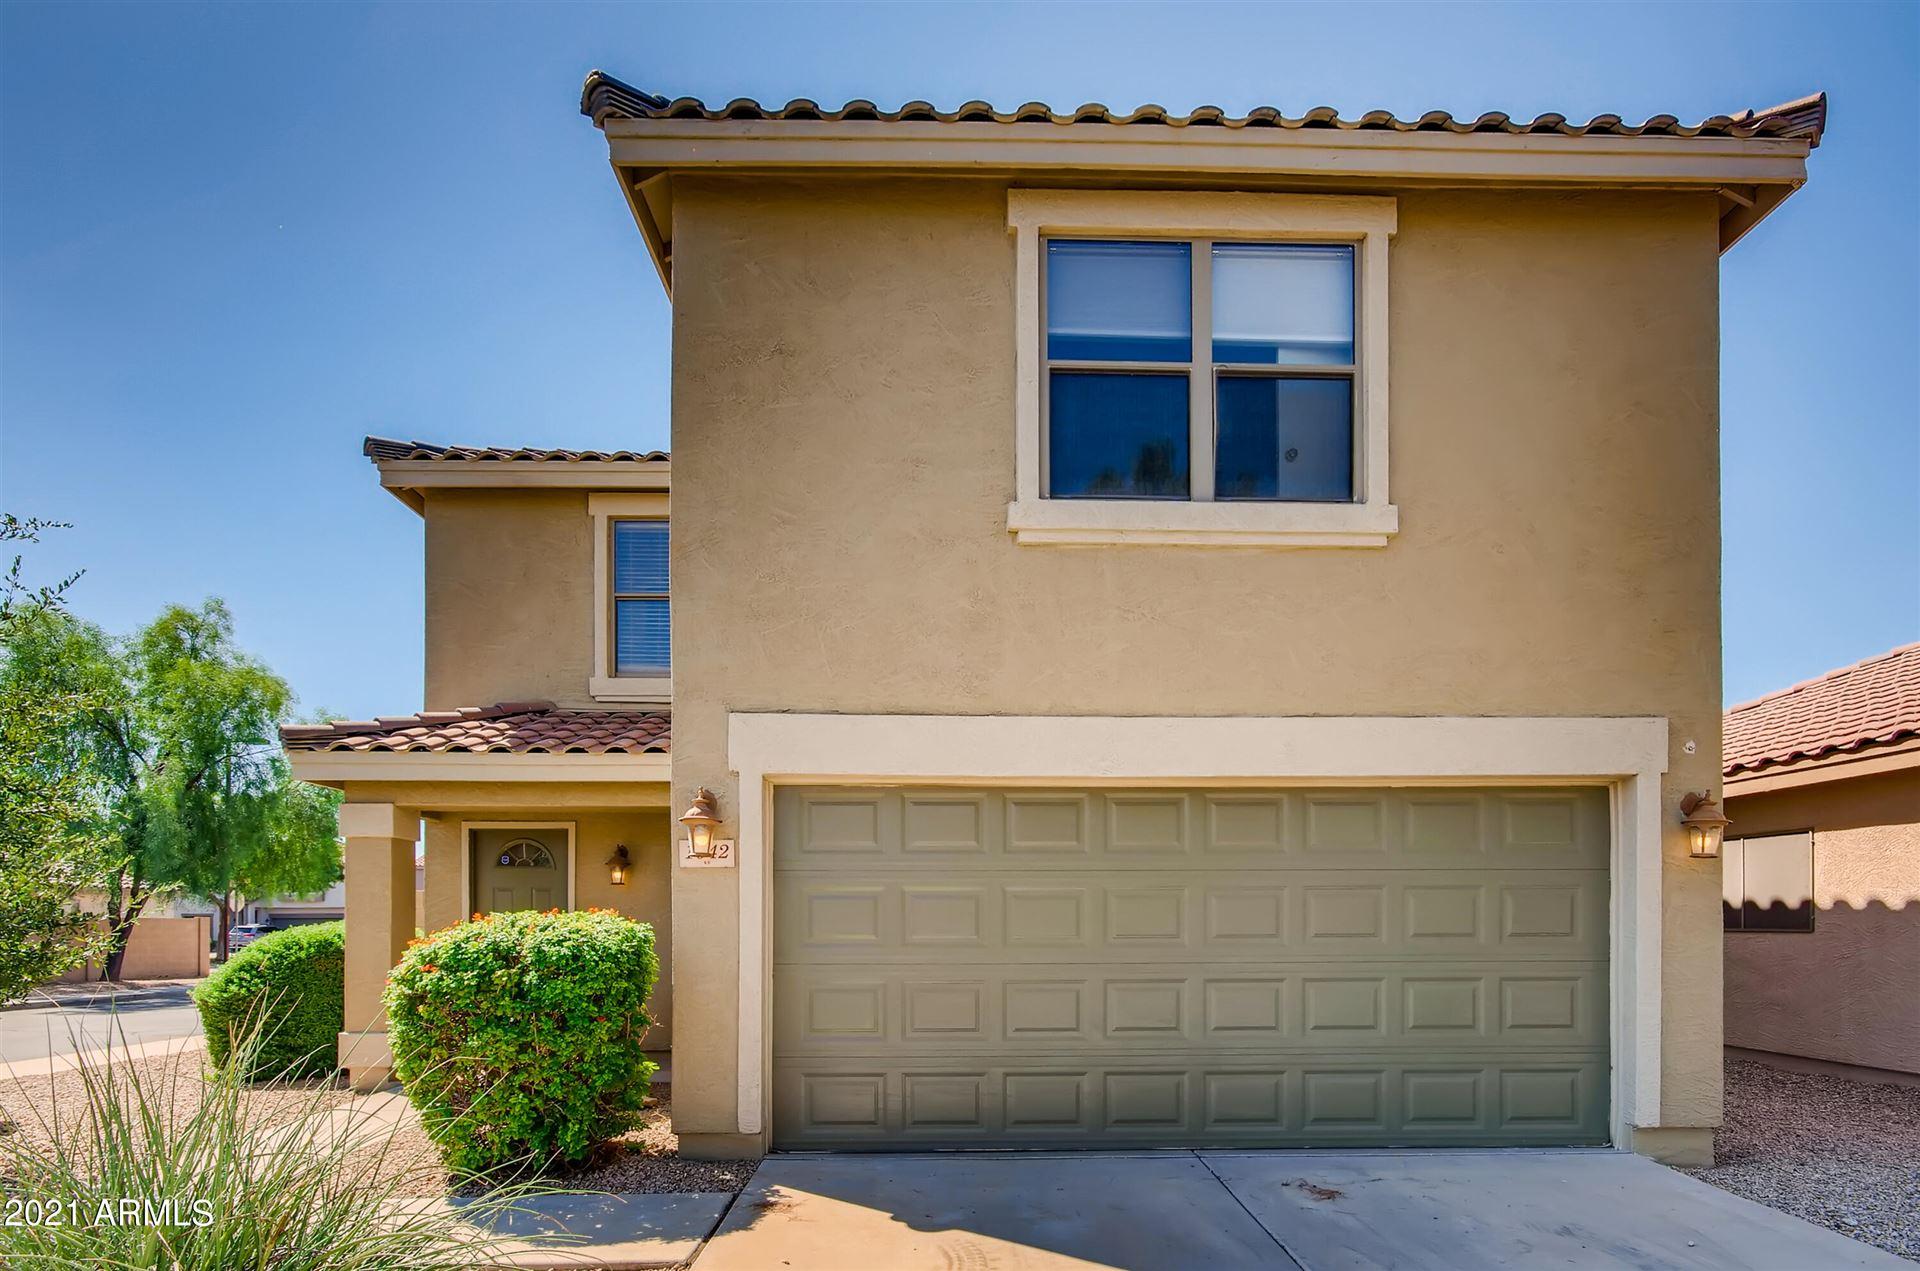 1042 S SAN VINCENTE Court, Chandler, AZ 85286 - MLS#: 6294883